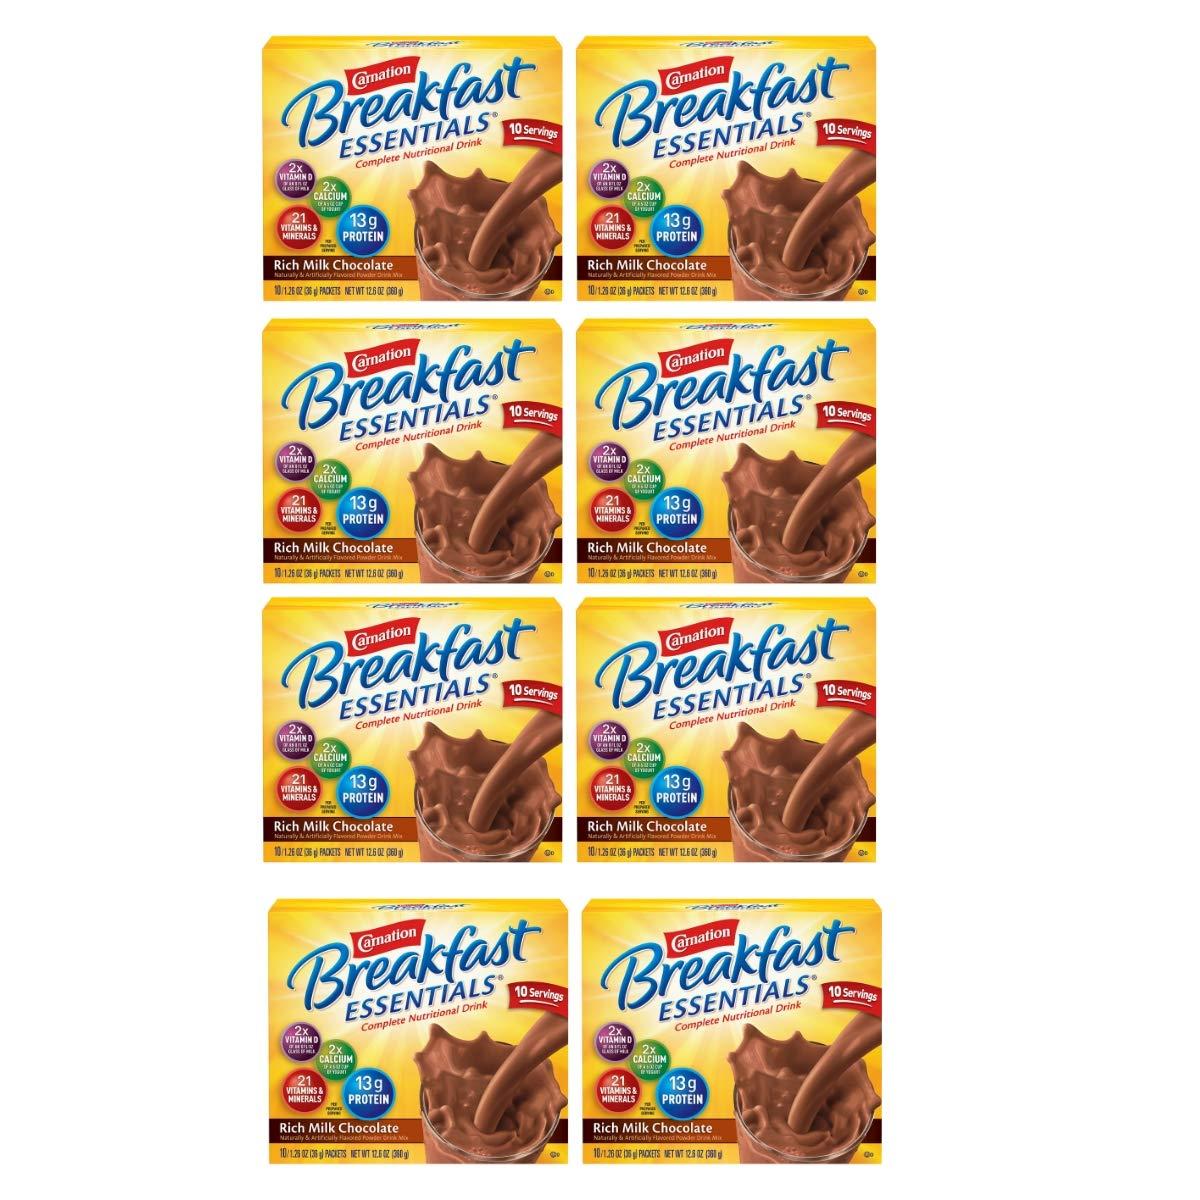 Carnation Breakfast Essentials Powder Drink Mix, Rich Milk Chocolate, 10 Count Box of 1.26 oz Packets, 8 Pack (Rich Milk Chocolate, 80 Count)